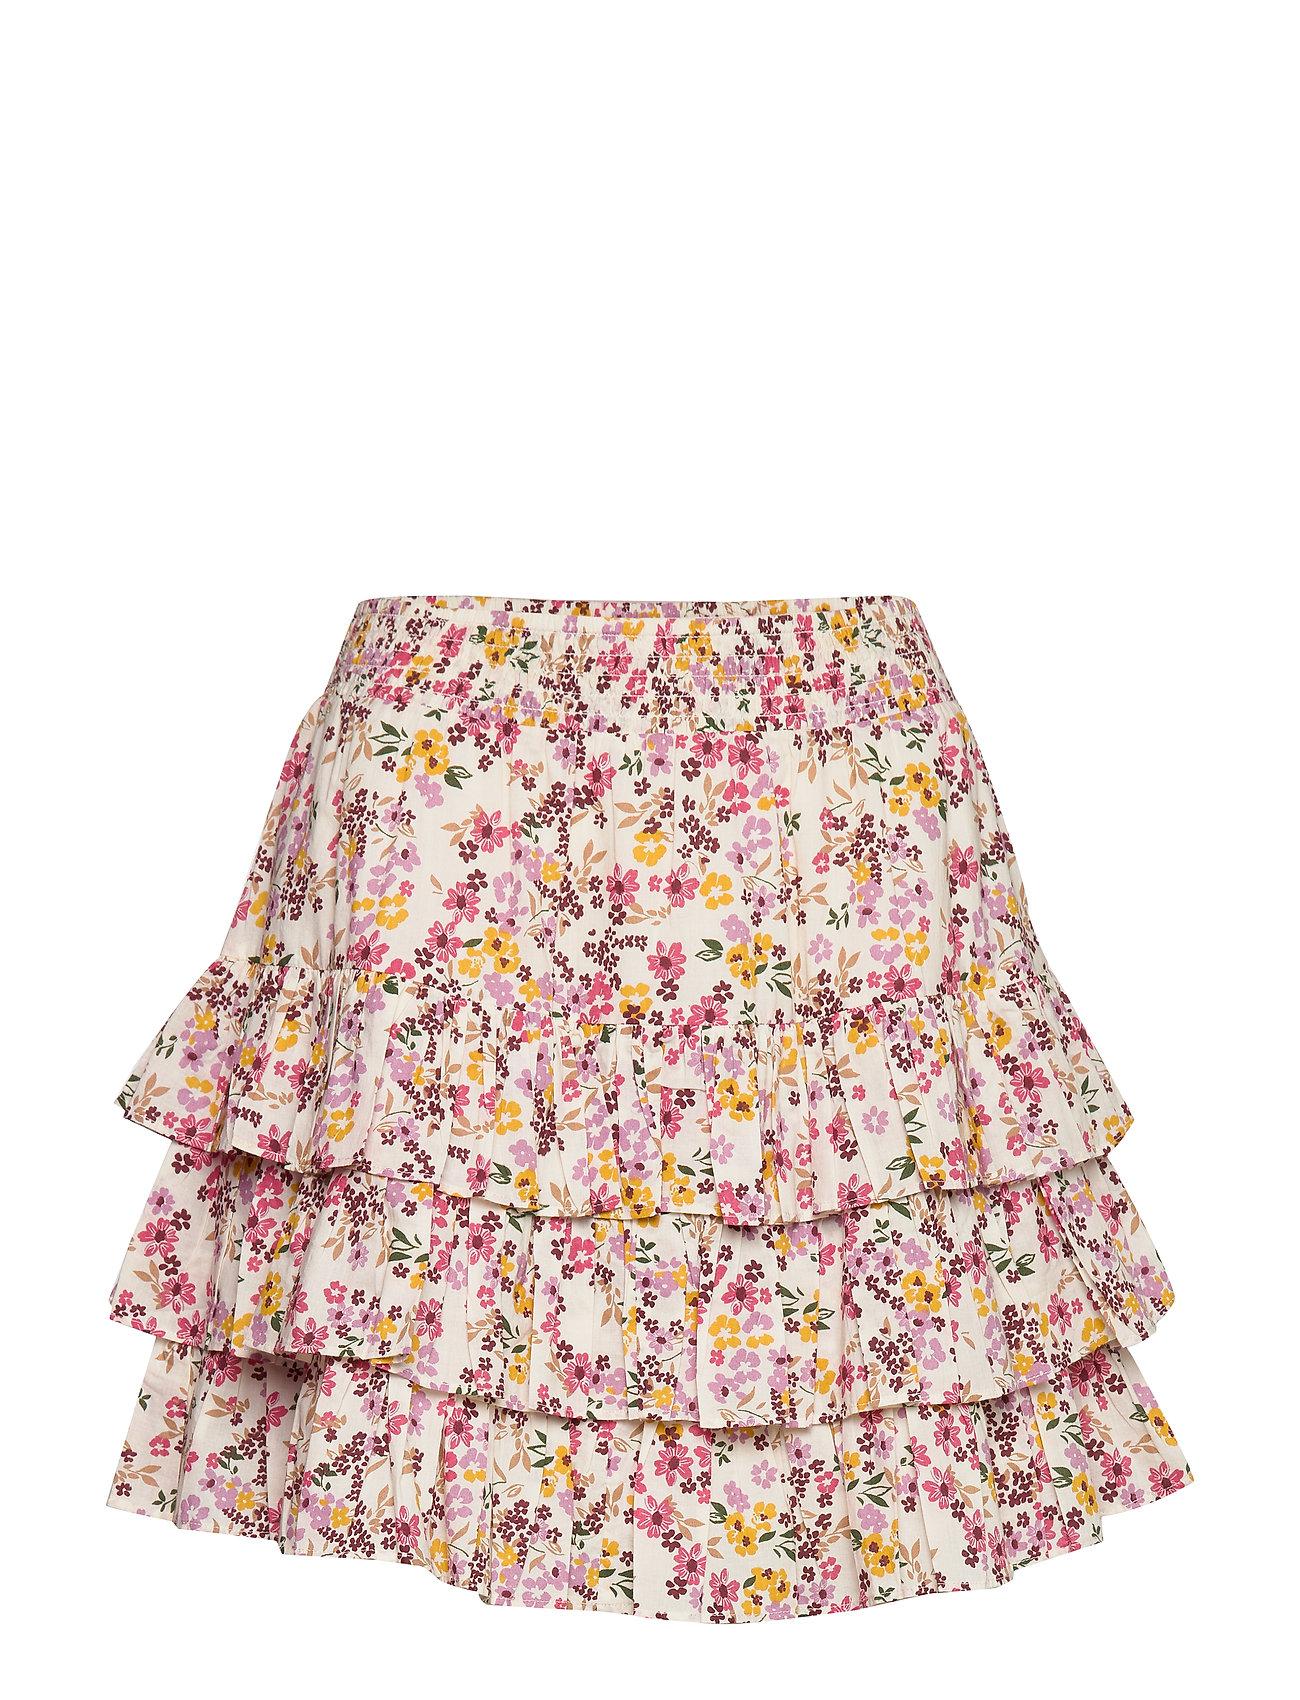 by Ti Mo Bohemian Skirt - PRETTY GARDEN